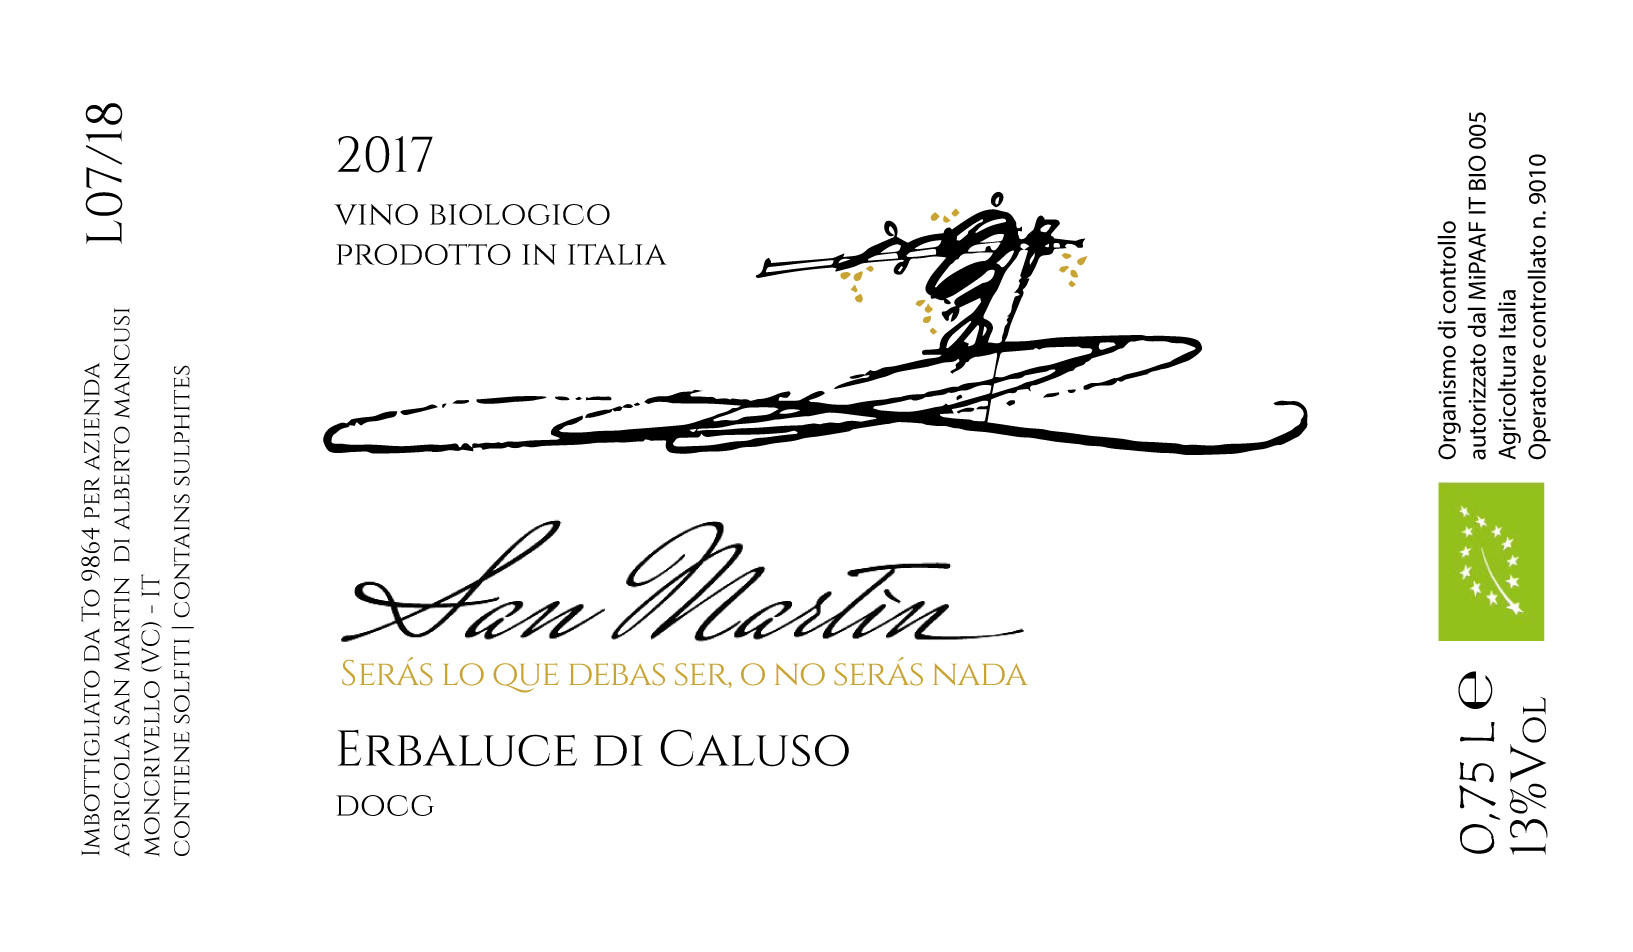 San Martin - Erbaluce di Caluso 2017 - w